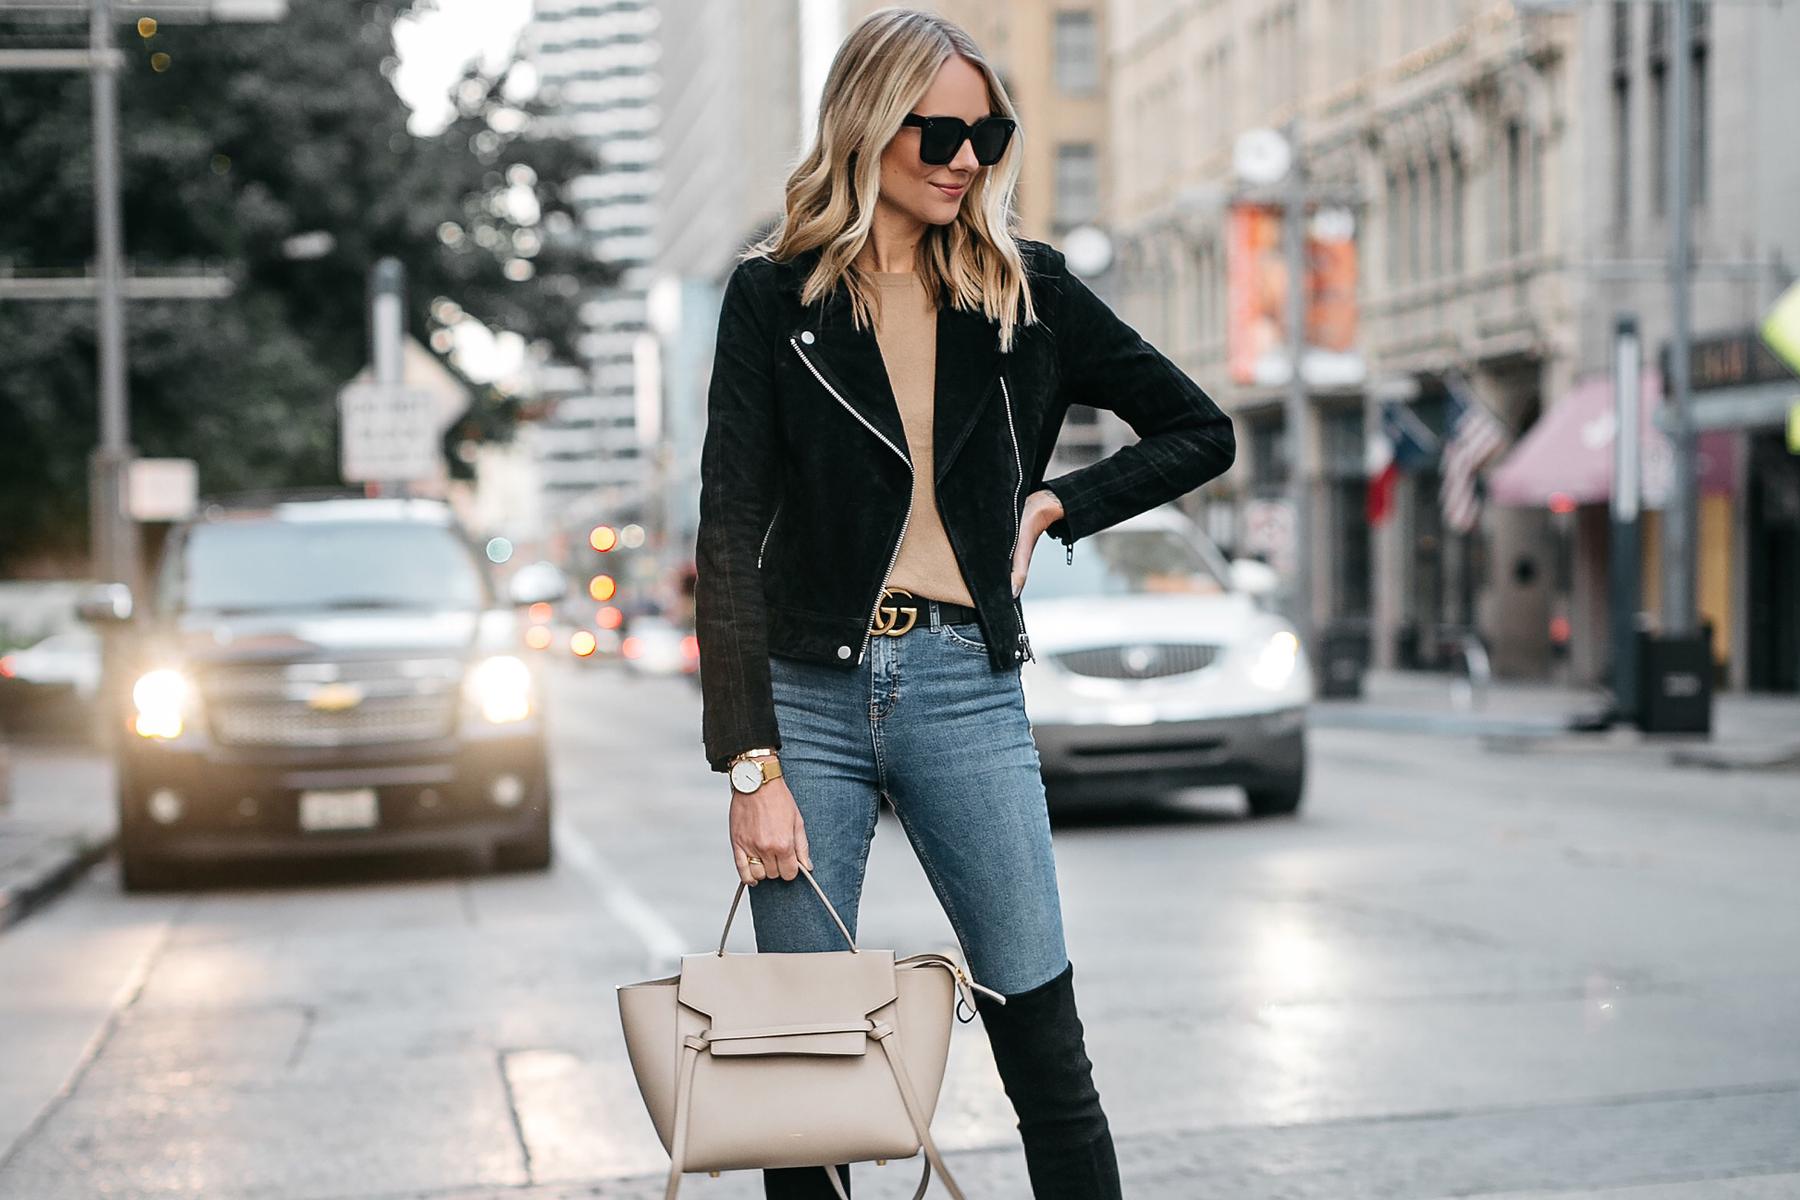 db553dba42c Blonde Woman Wearing Black Suede Moto Jacket Camel Sweater Denim Skinny  Jeans Celine Mini Belt Bag